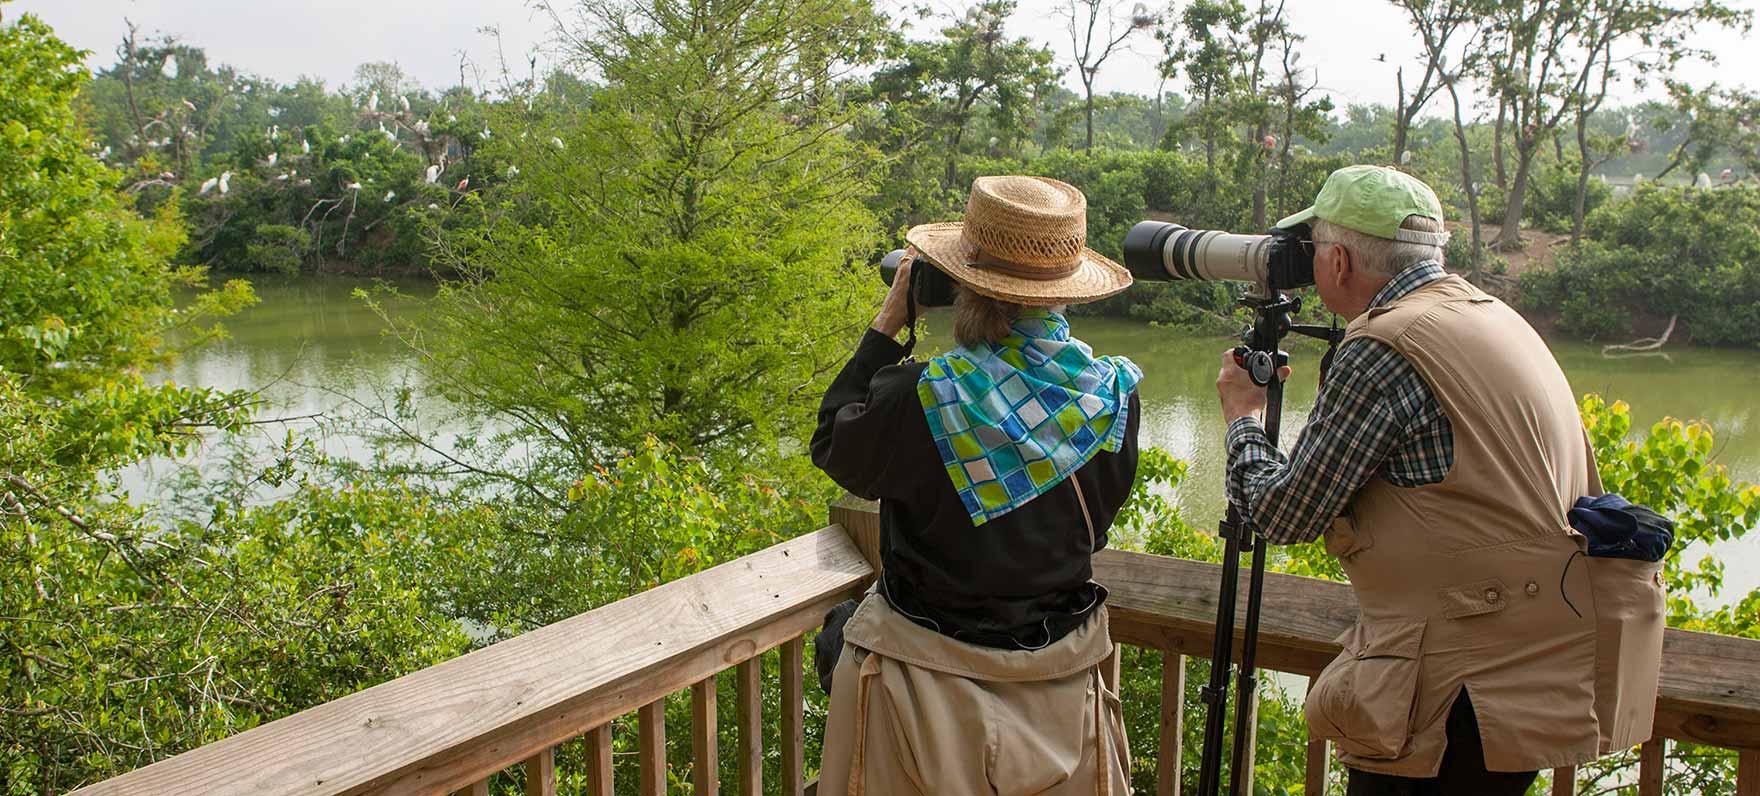 Share your bird sightings on eBird.